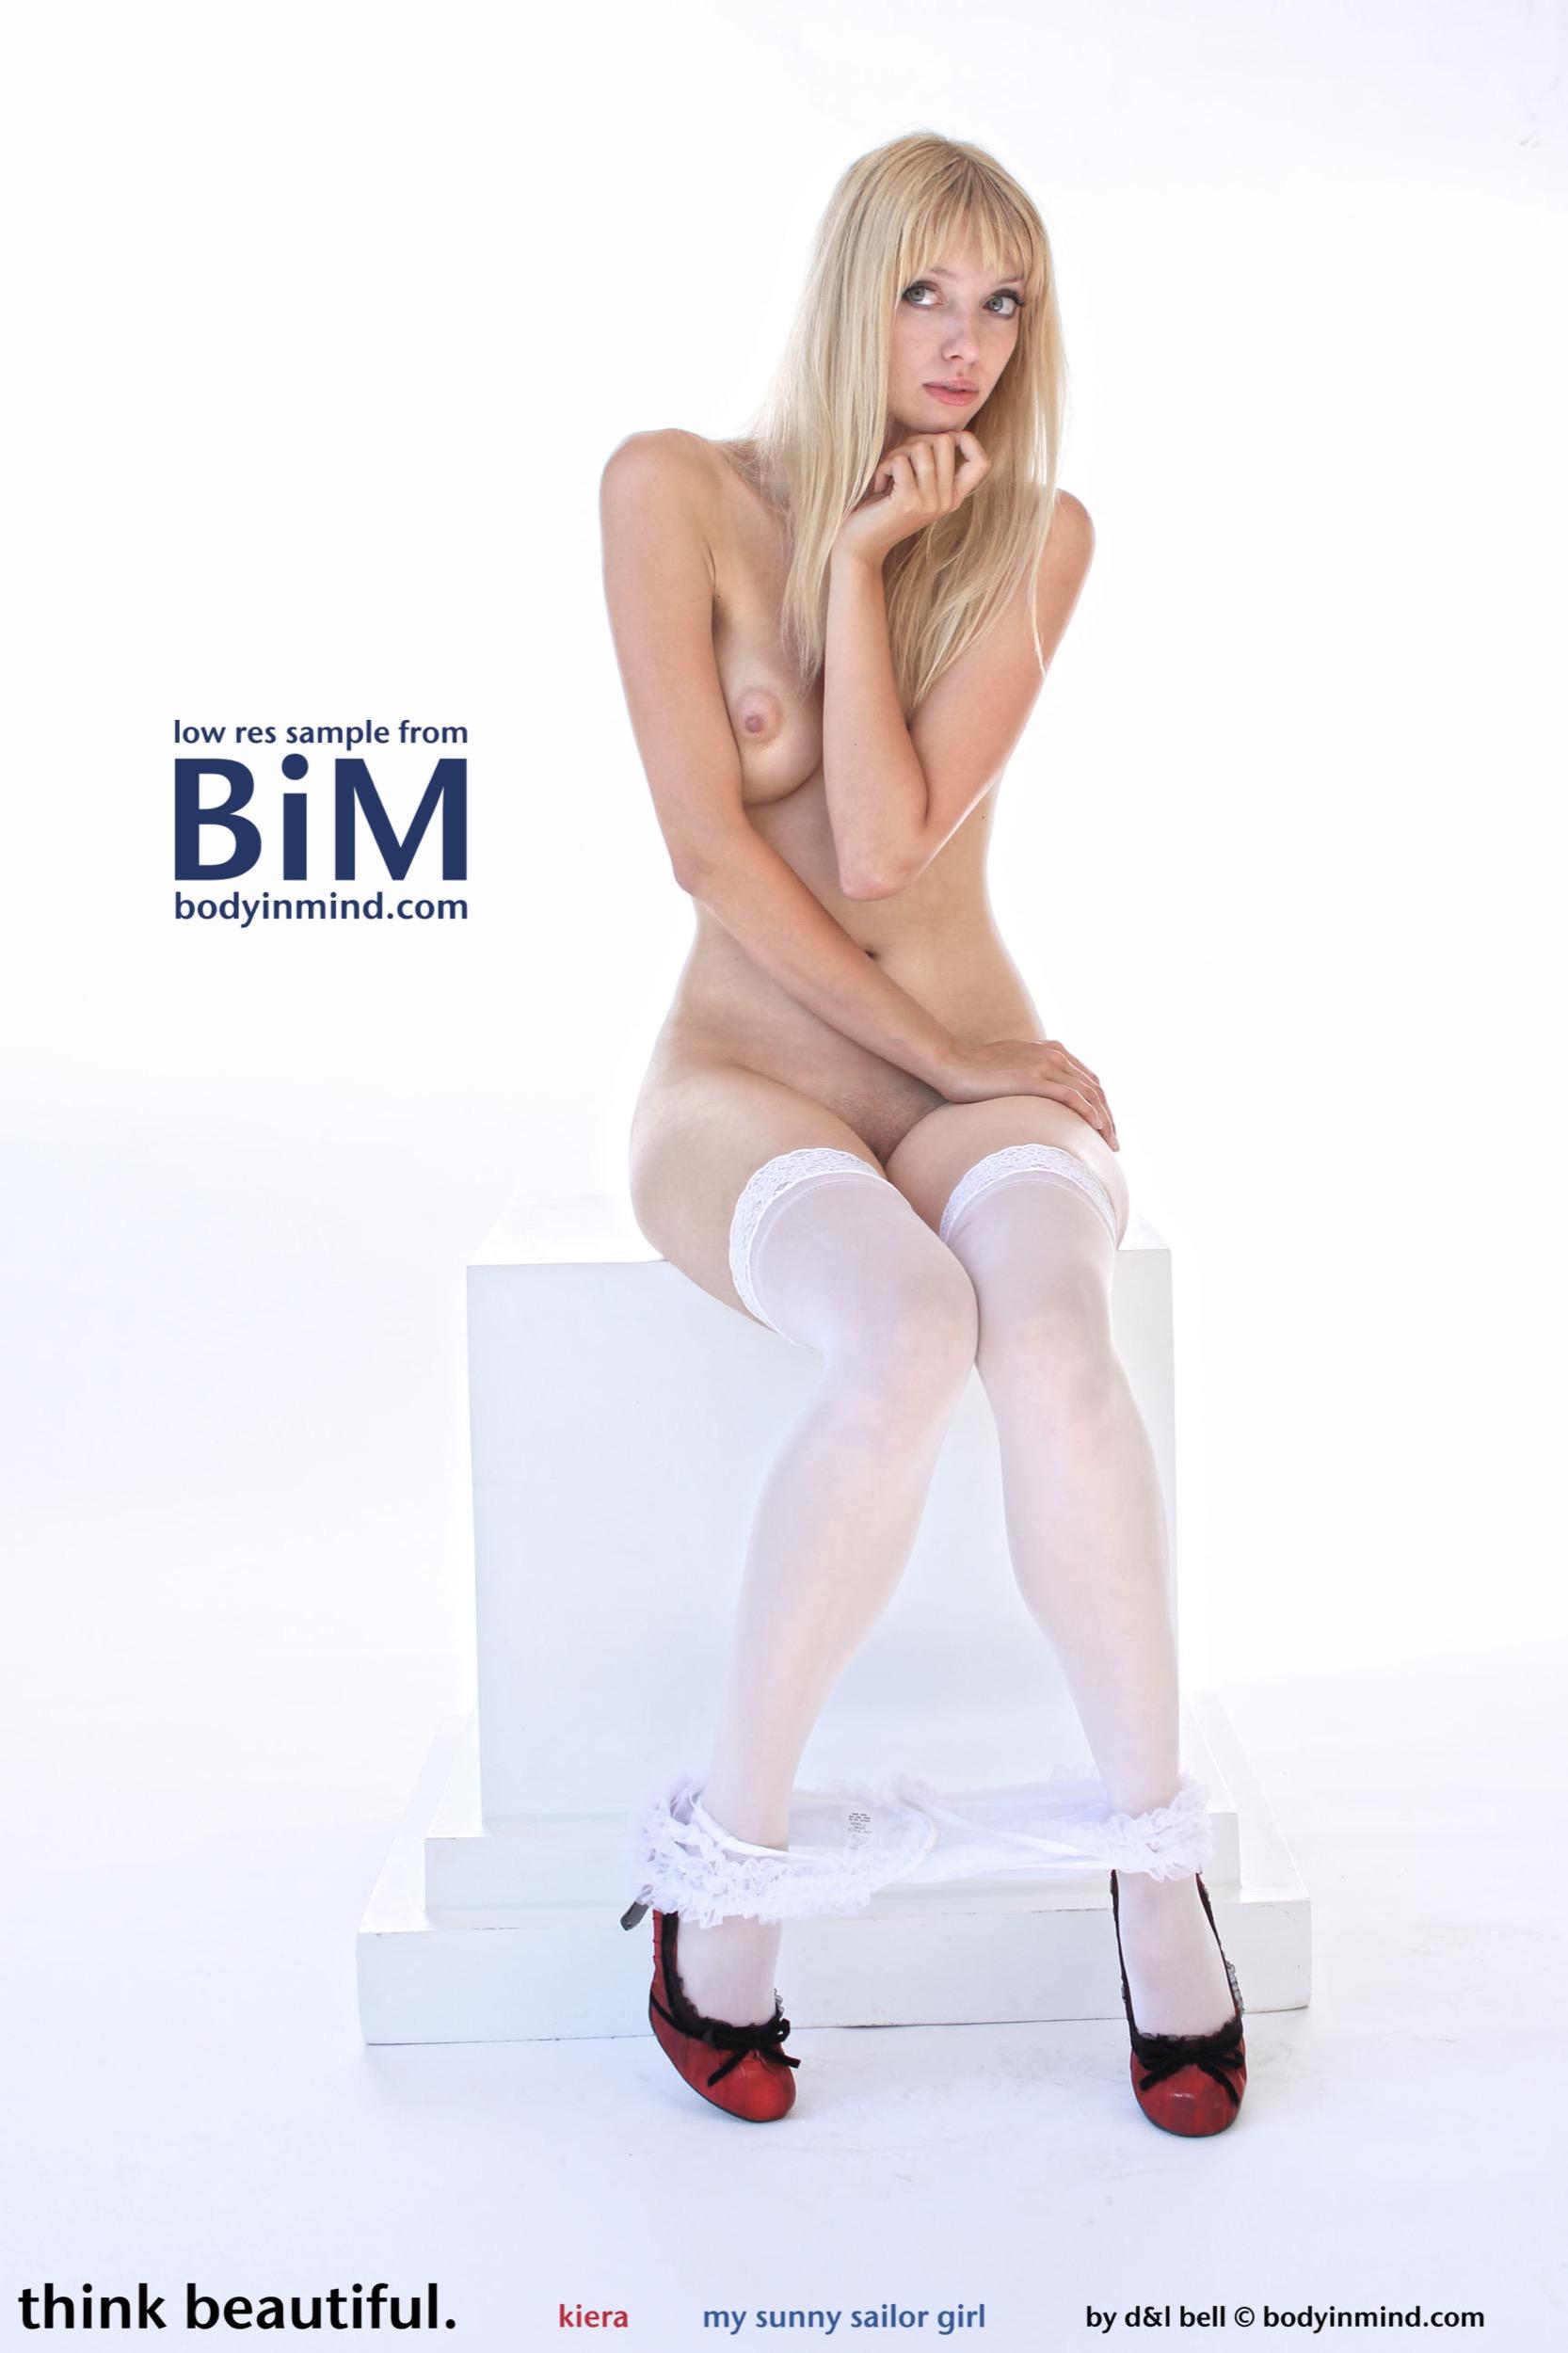 kiera-blonde-boobs-stockings-naked-bodyinmind-10